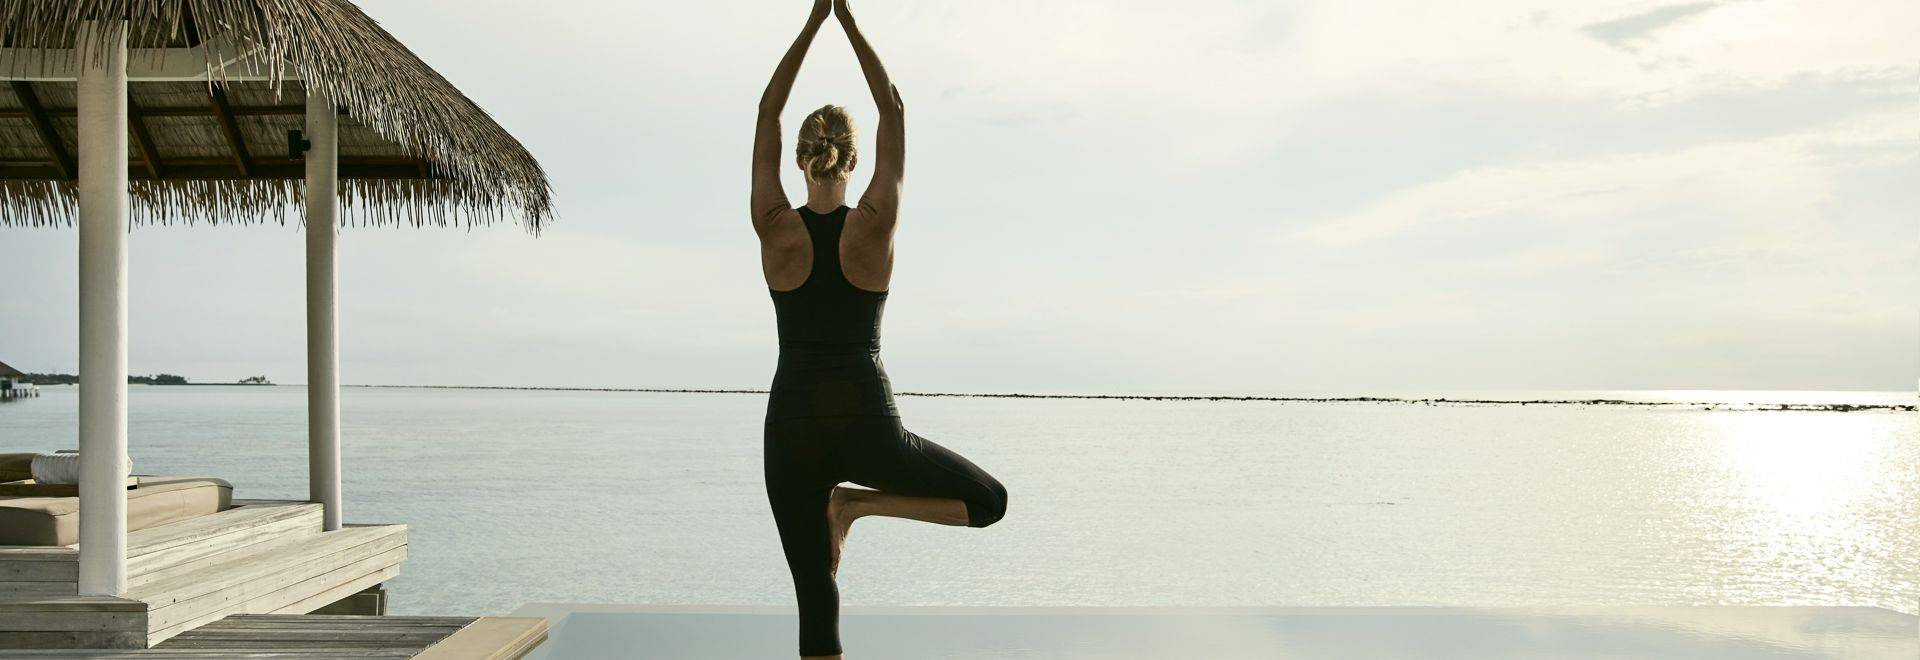 MM 20 COMO_CMF_Water Villa_Yoga with model.jpg